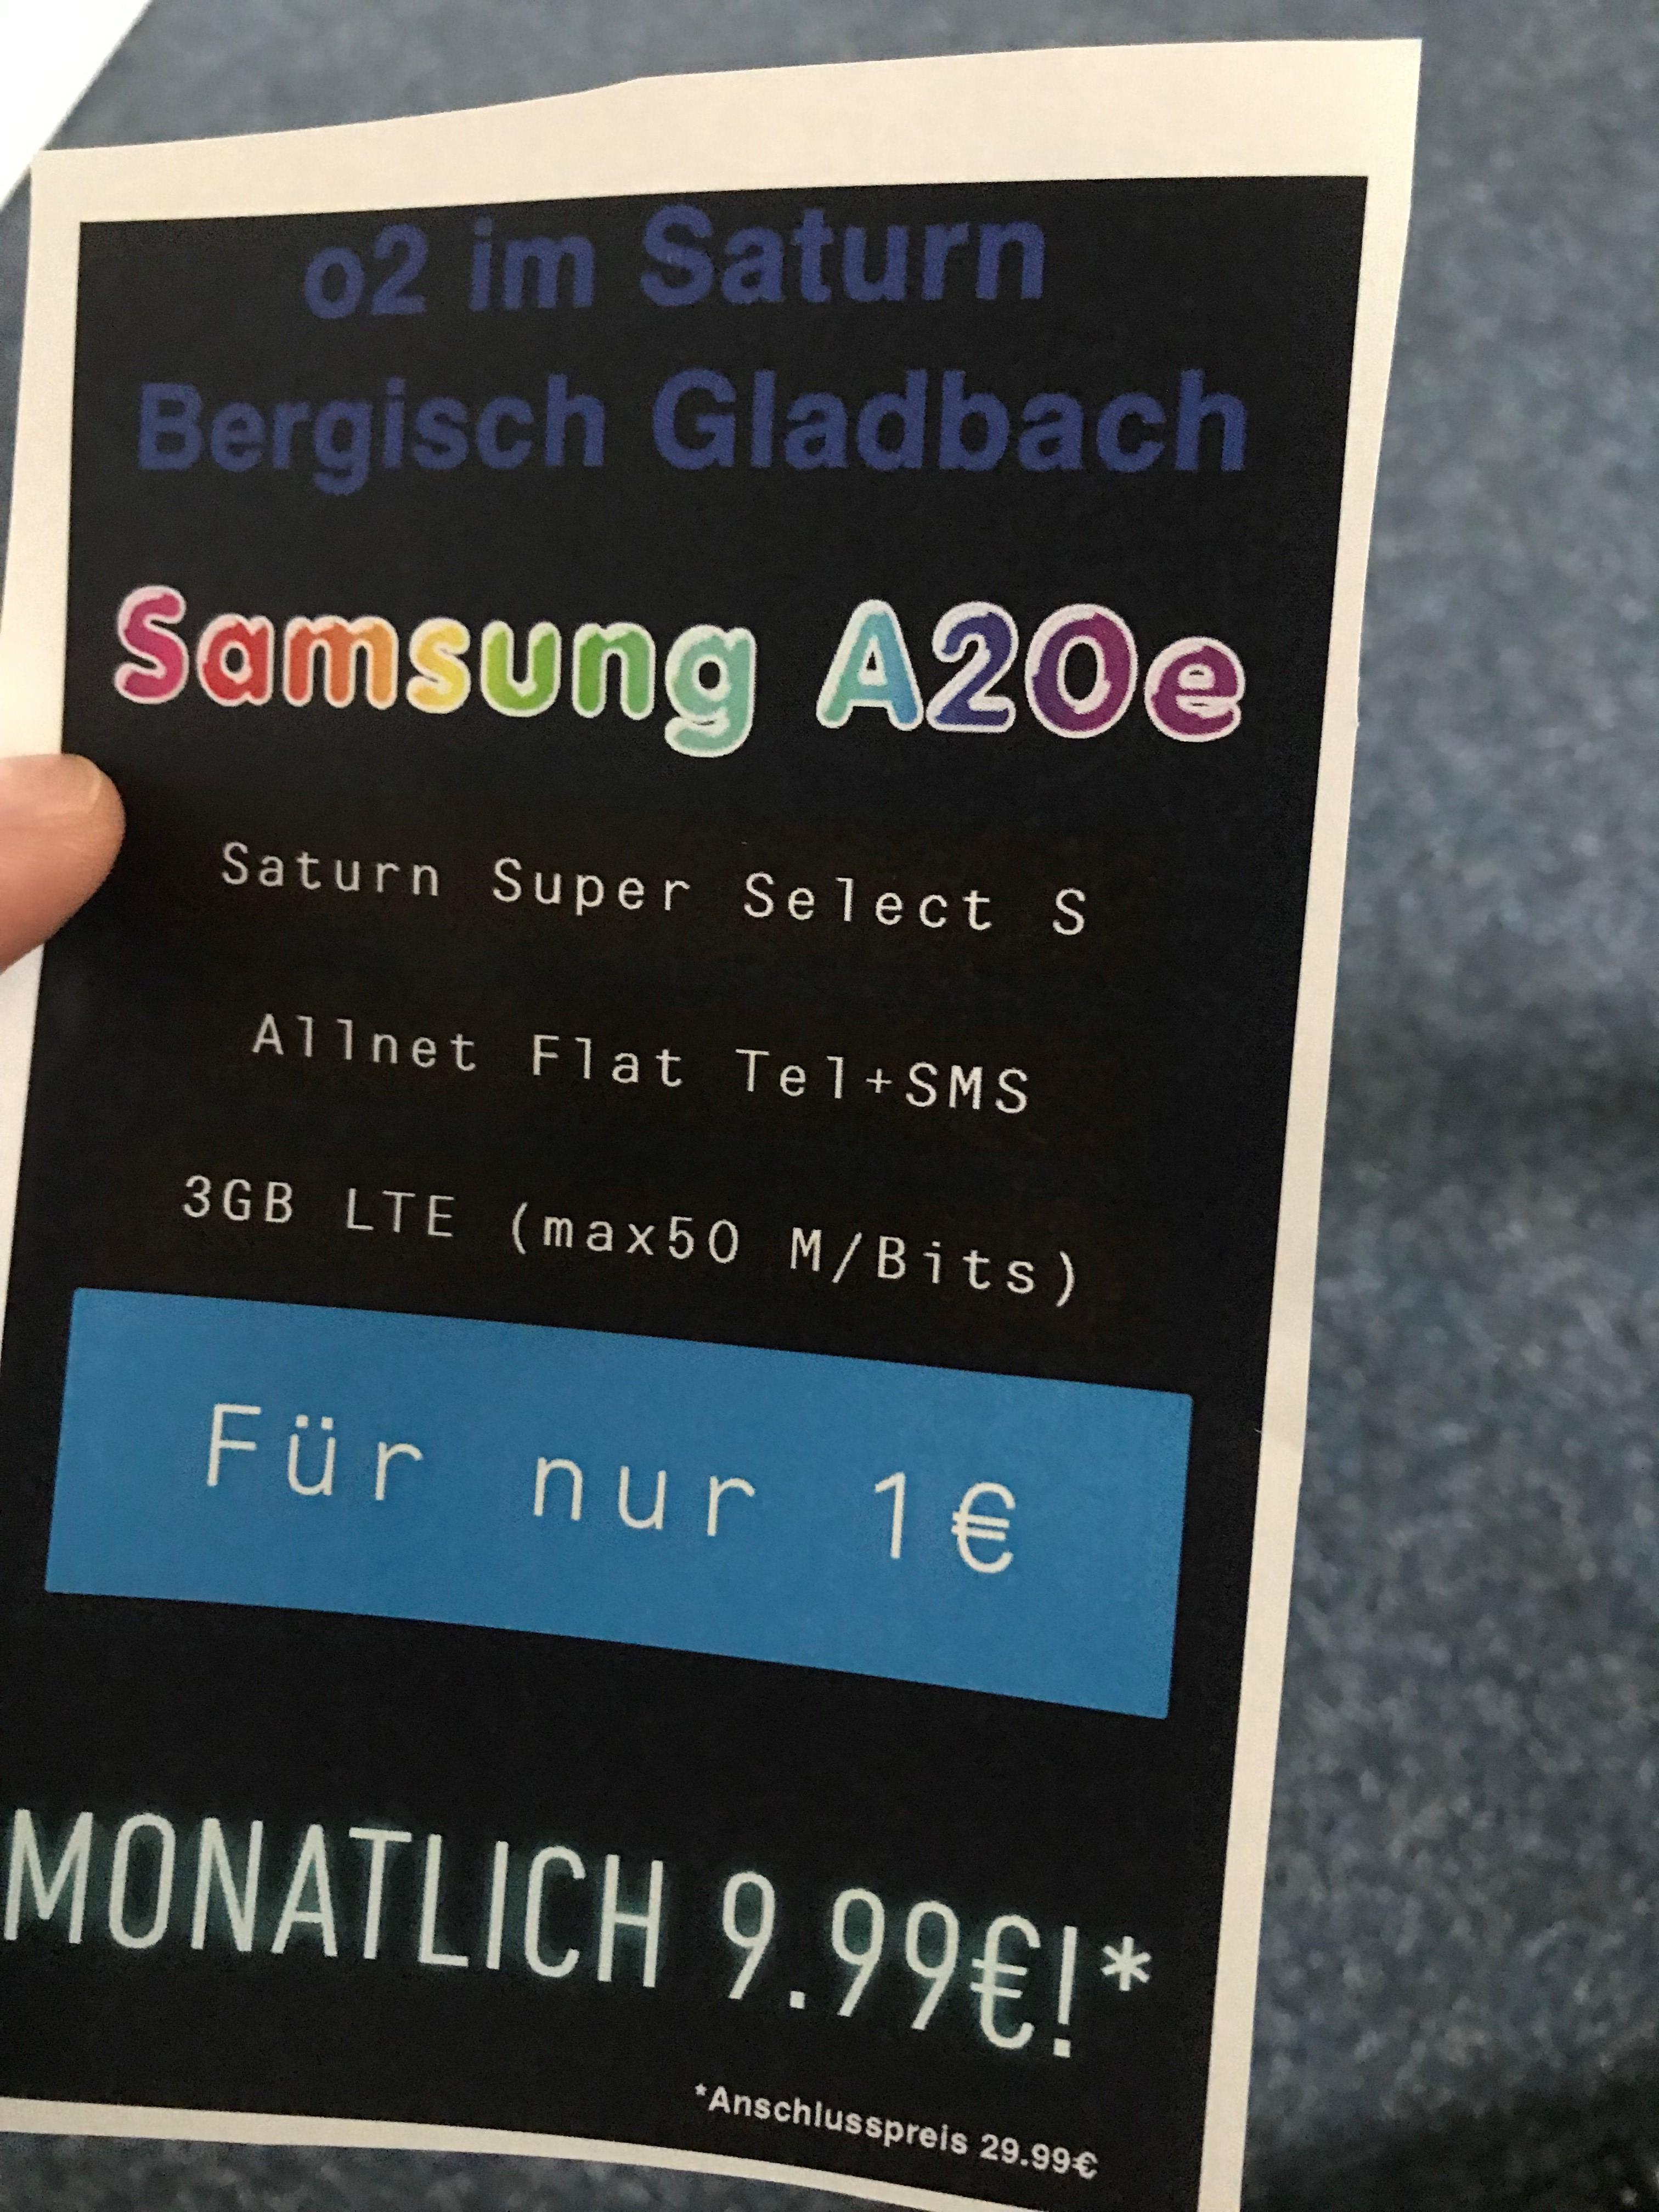 [Lokal] Saturn Bergisch Gladbach A20e Duos [32 GB] für 1€ ZZ im Saturn Super Select S (Flat Tel + Flat SMS + 3 GB LTE) mtl. 9,99€